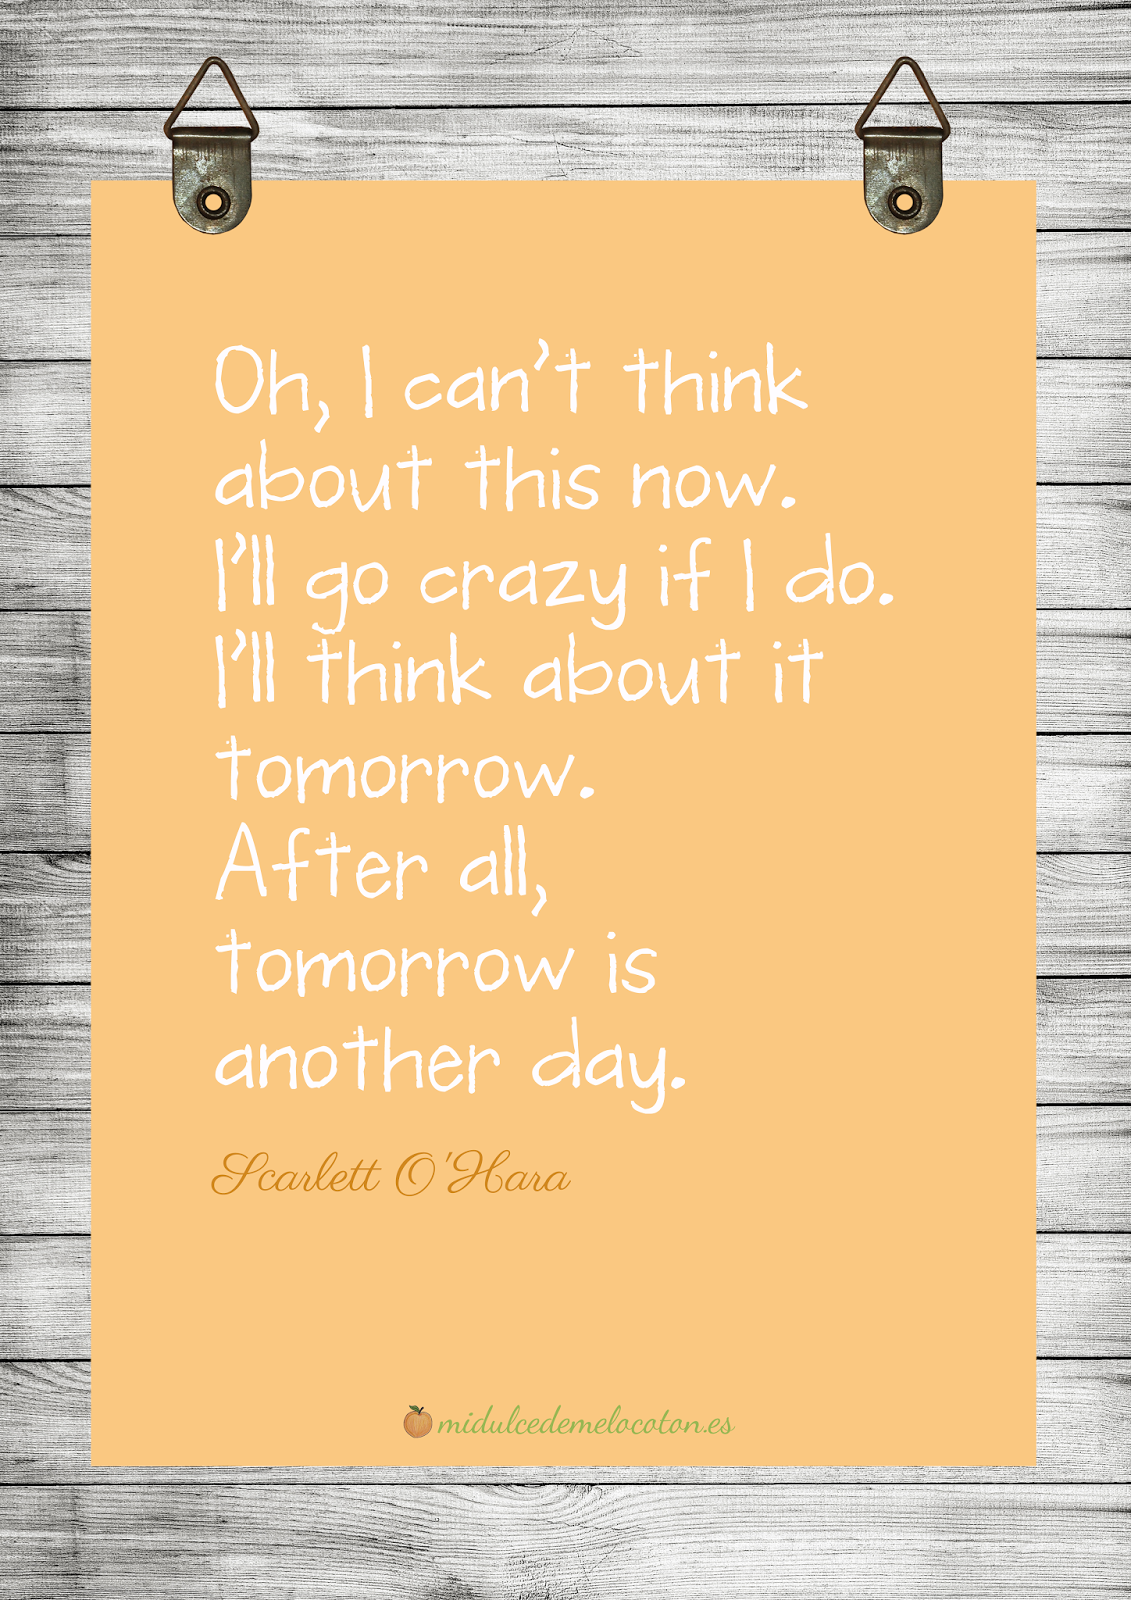 ya lo pensare mañana